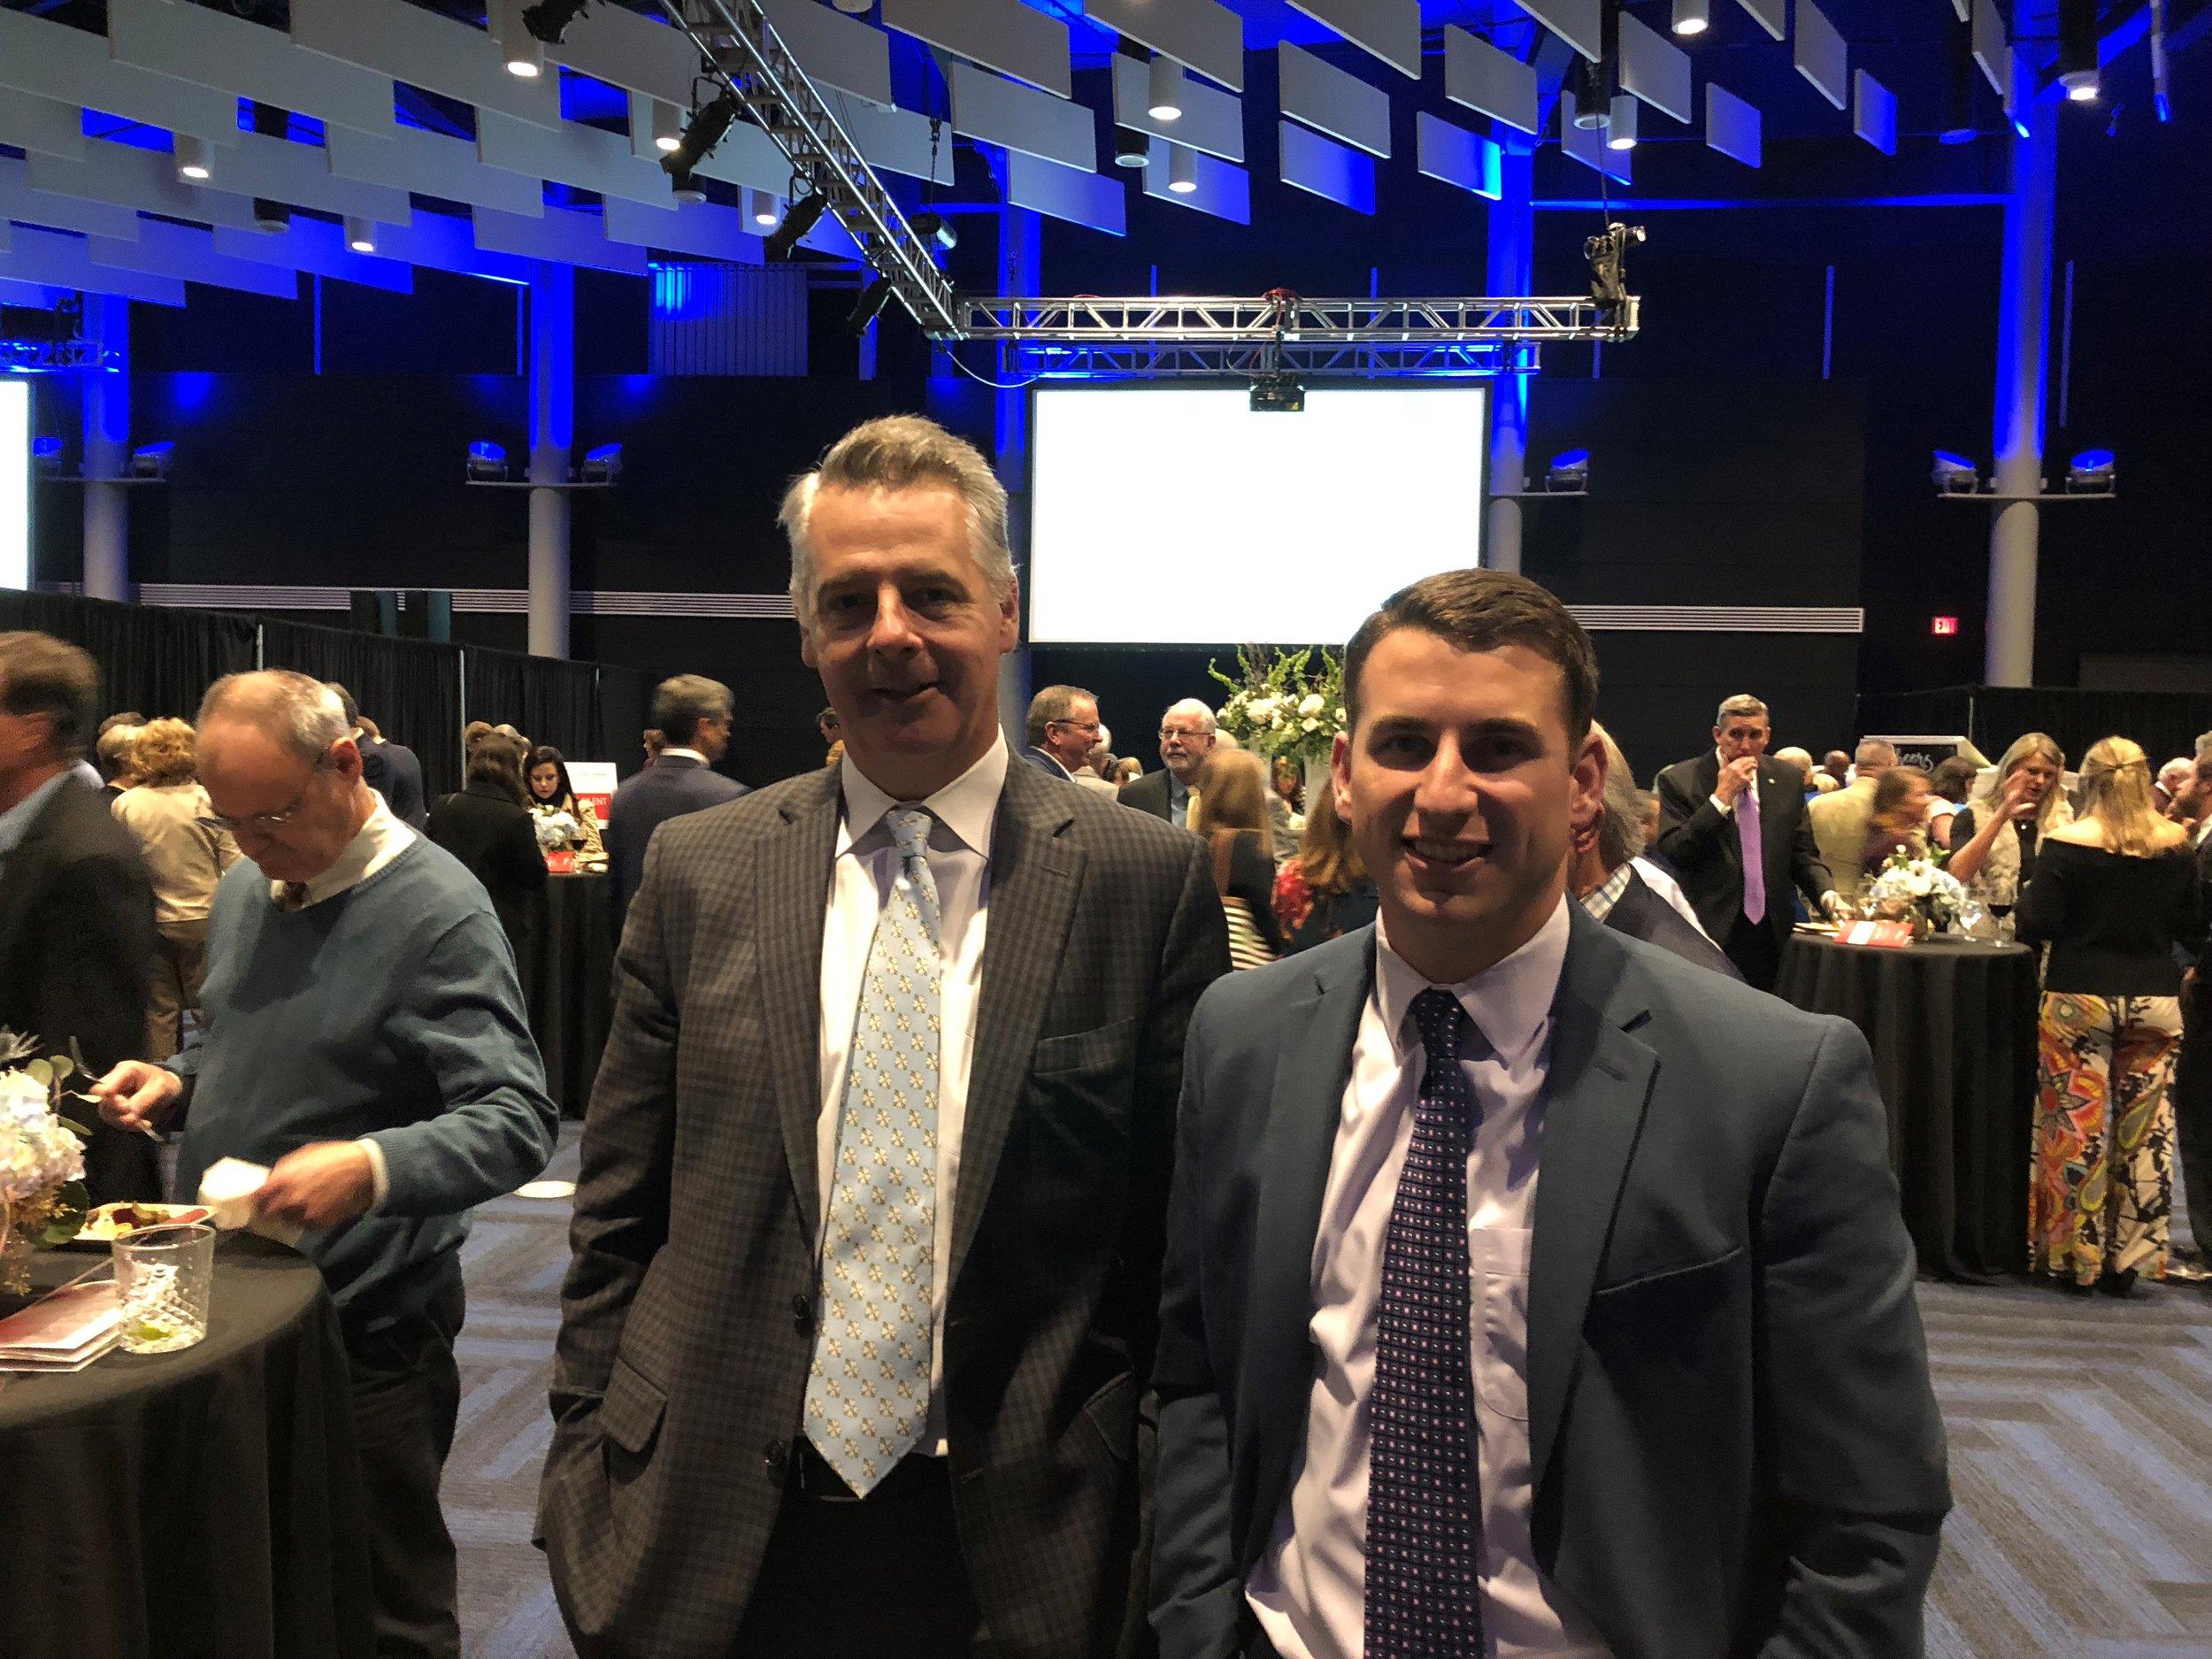 TD&Co's Jack Kasprzak, CIO (left) and Brant Jones, CFP® (right)